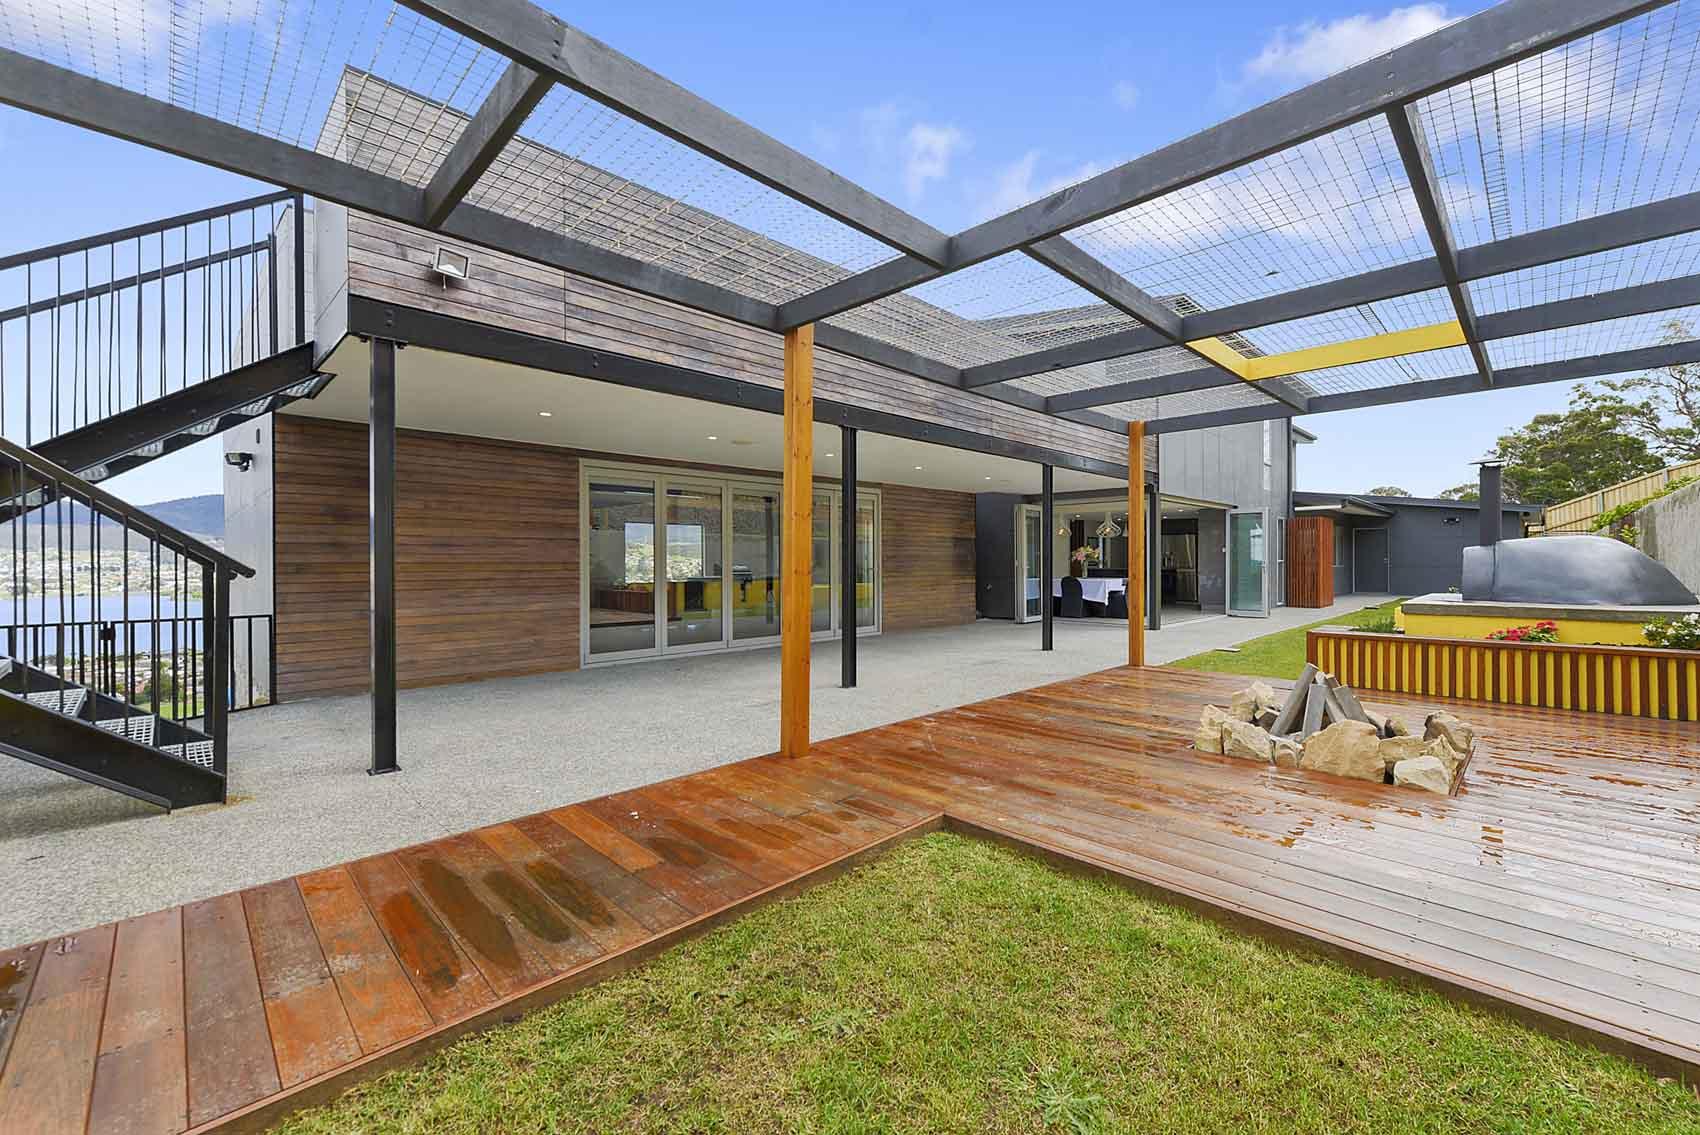 hobart-builders-321-build-tasmania-new-home-renovations-3